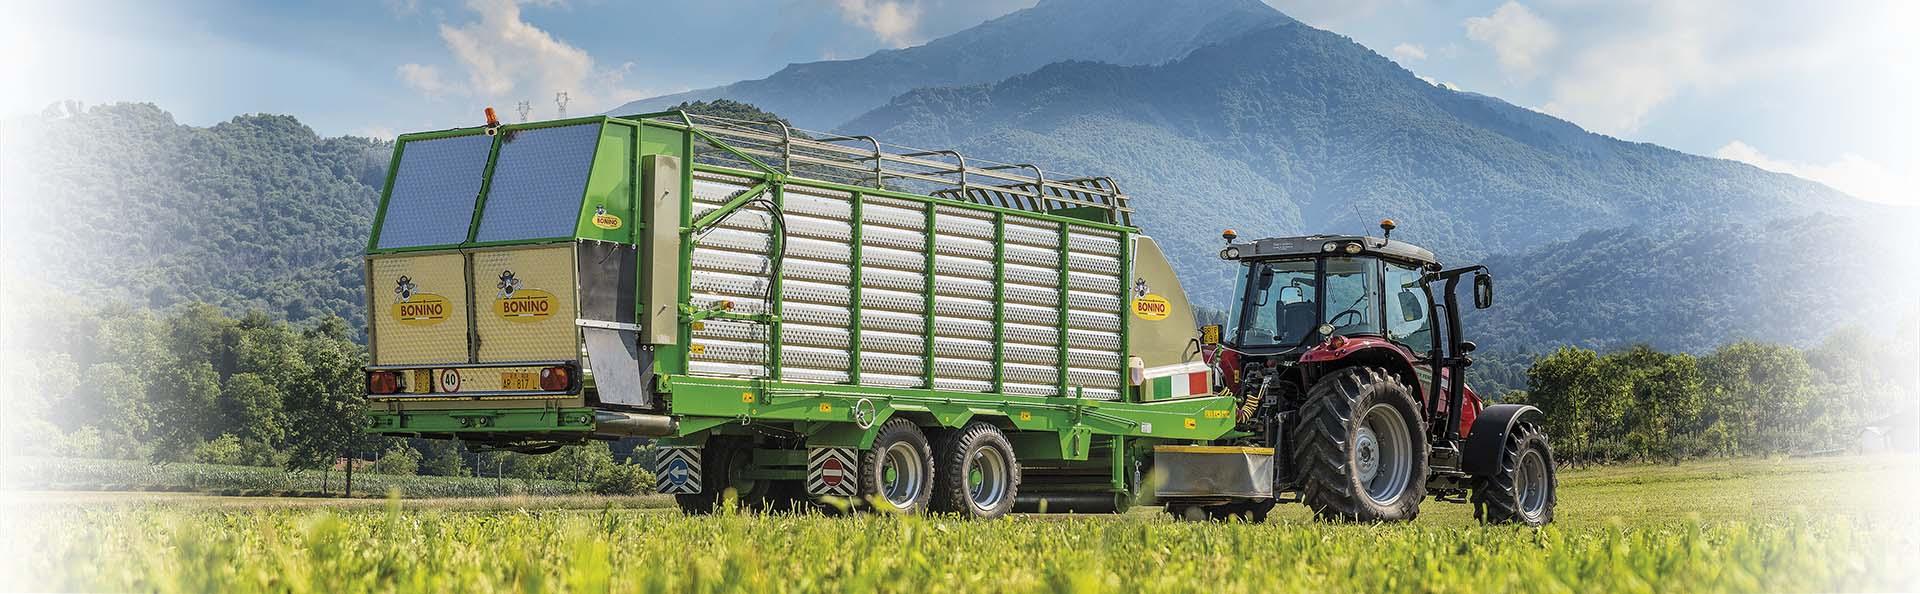 Bonino-carro-falcia-autocaricante-Venere-700-Self-loading-grazer-wagon-remorque-faucheuse-autochargeuse-remolque-segador-autocargador-Landmaschinen-Mähladewagen